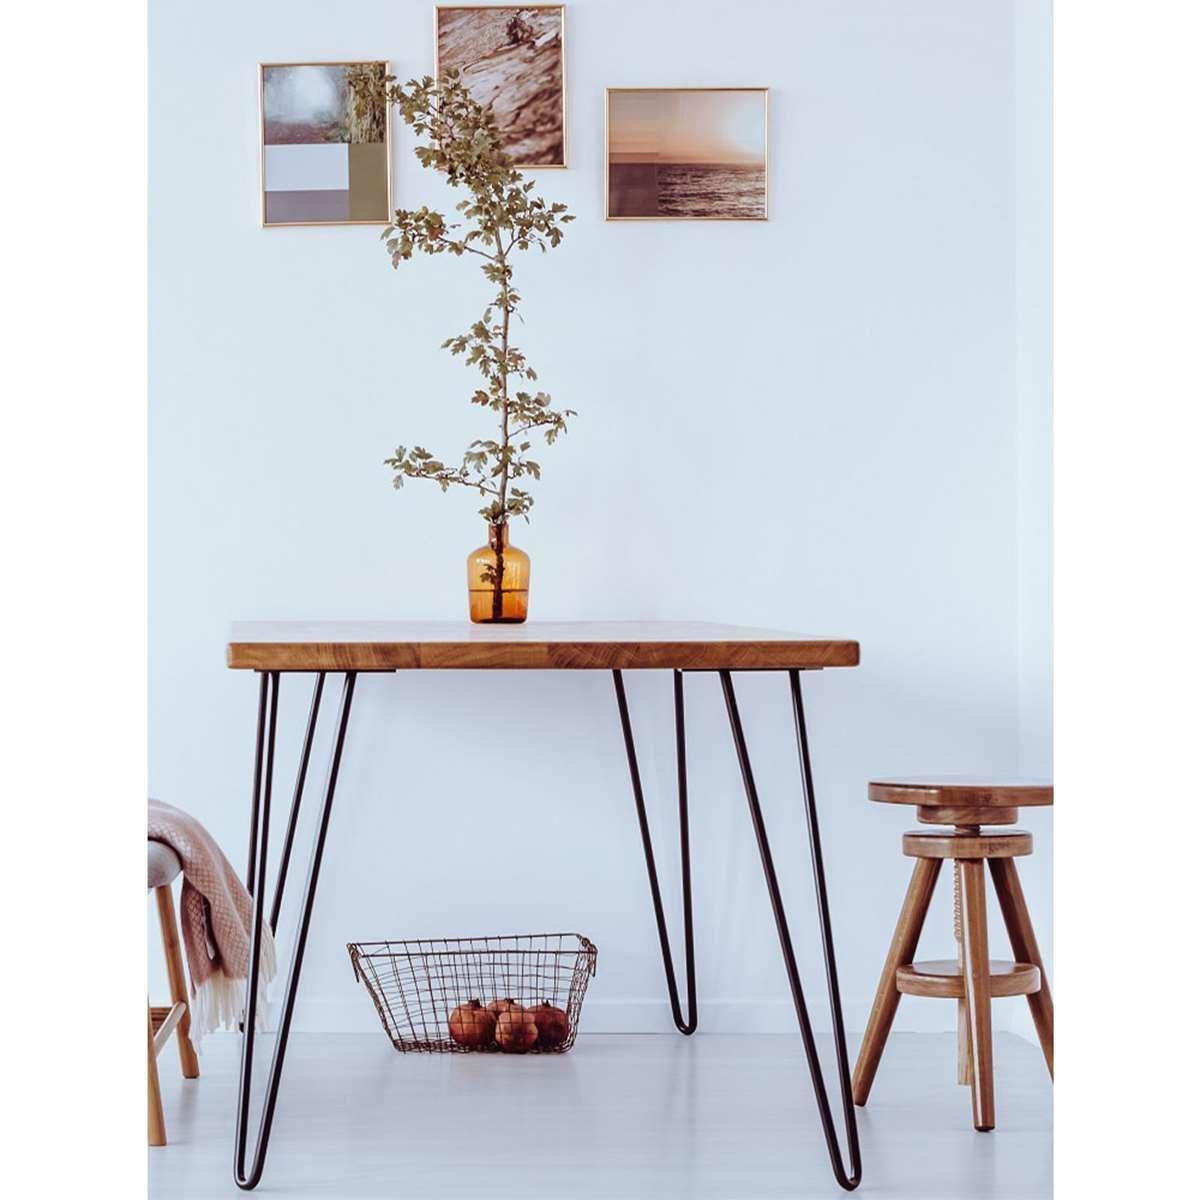 Masa din Lemn Masiv culoarea Stejar , 100x60x75 cm